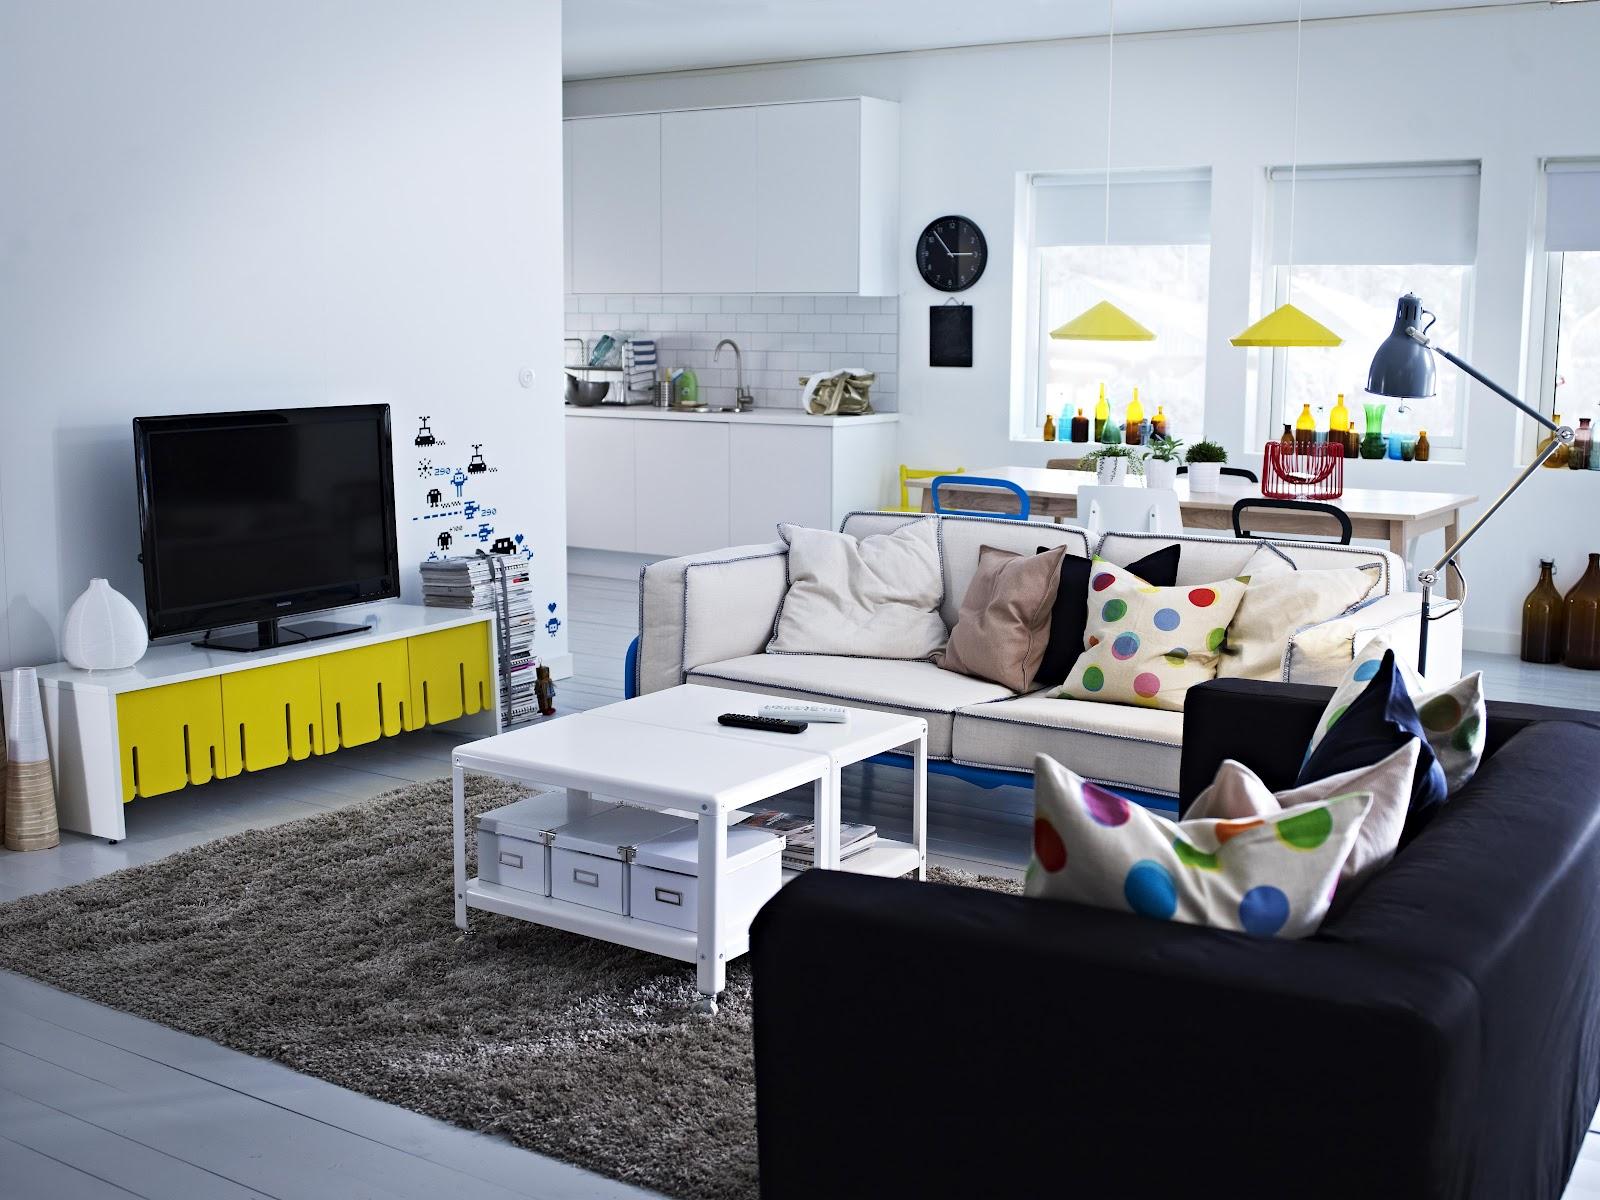 decor me nuevo cat logo ikea 2013 salones con color. Black Bedroom Furniture Sets. Home Design Ideas